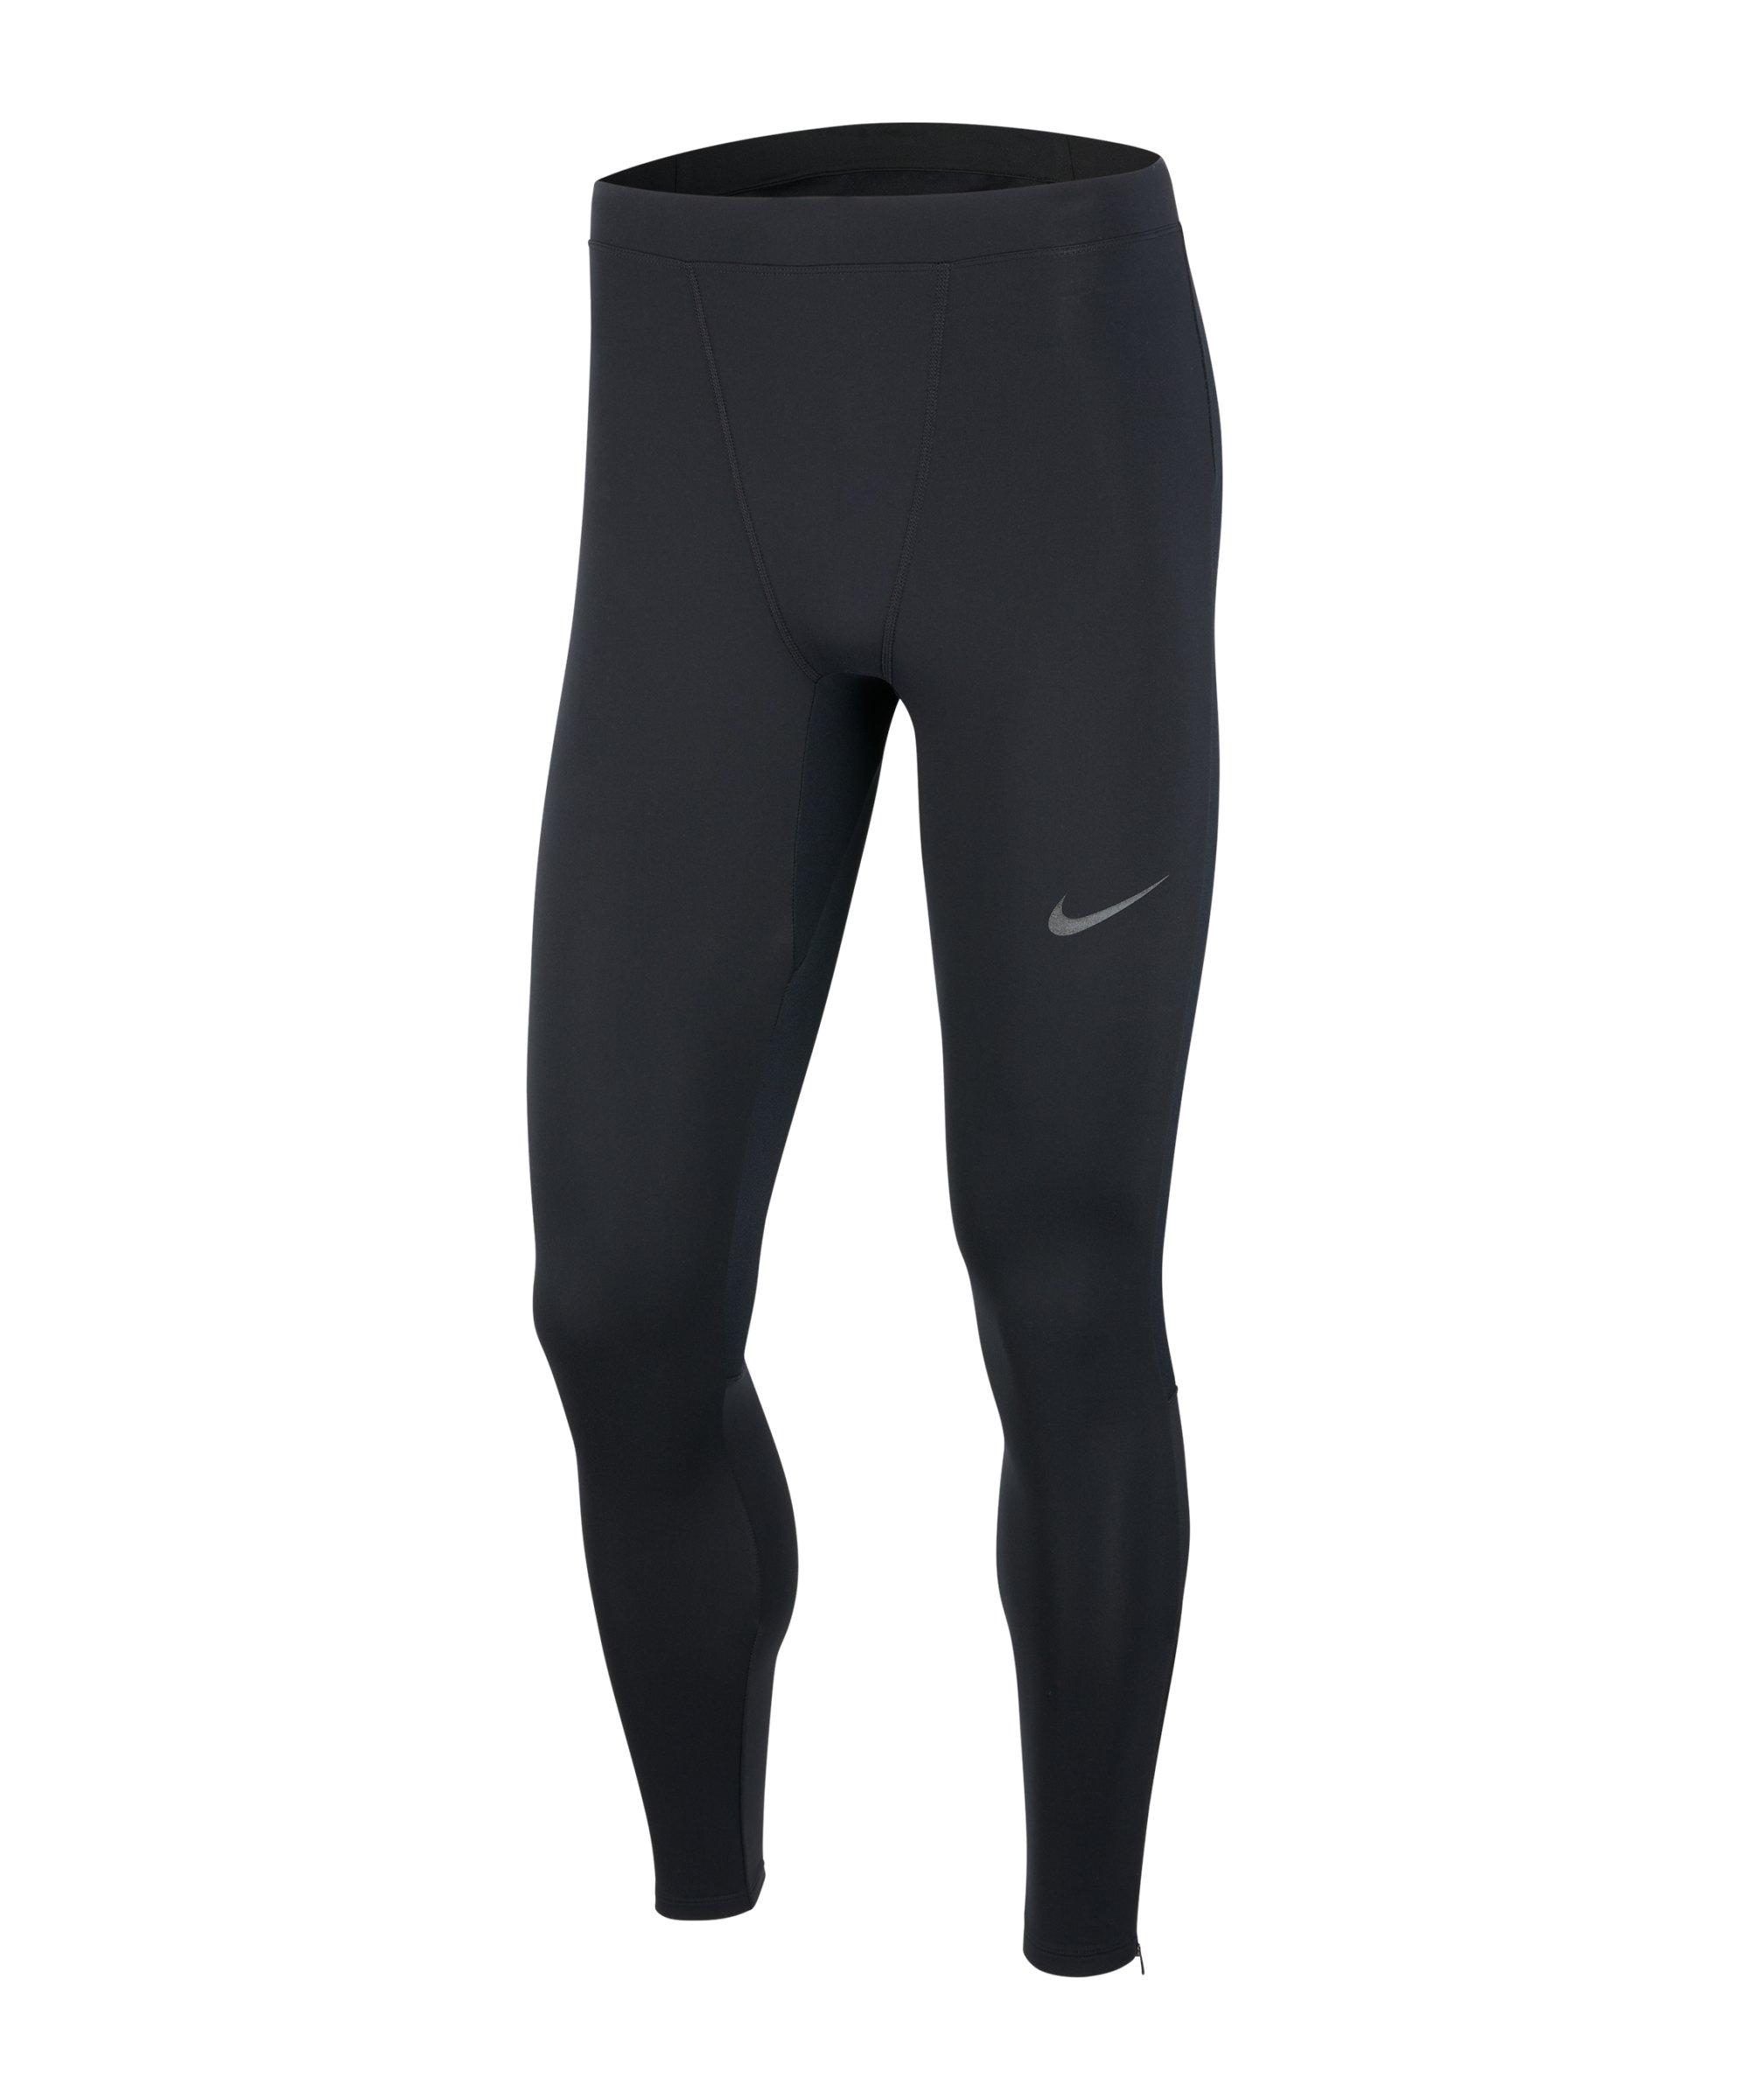 Nike Thermal Hose Running Schwarz F010 - schwarz